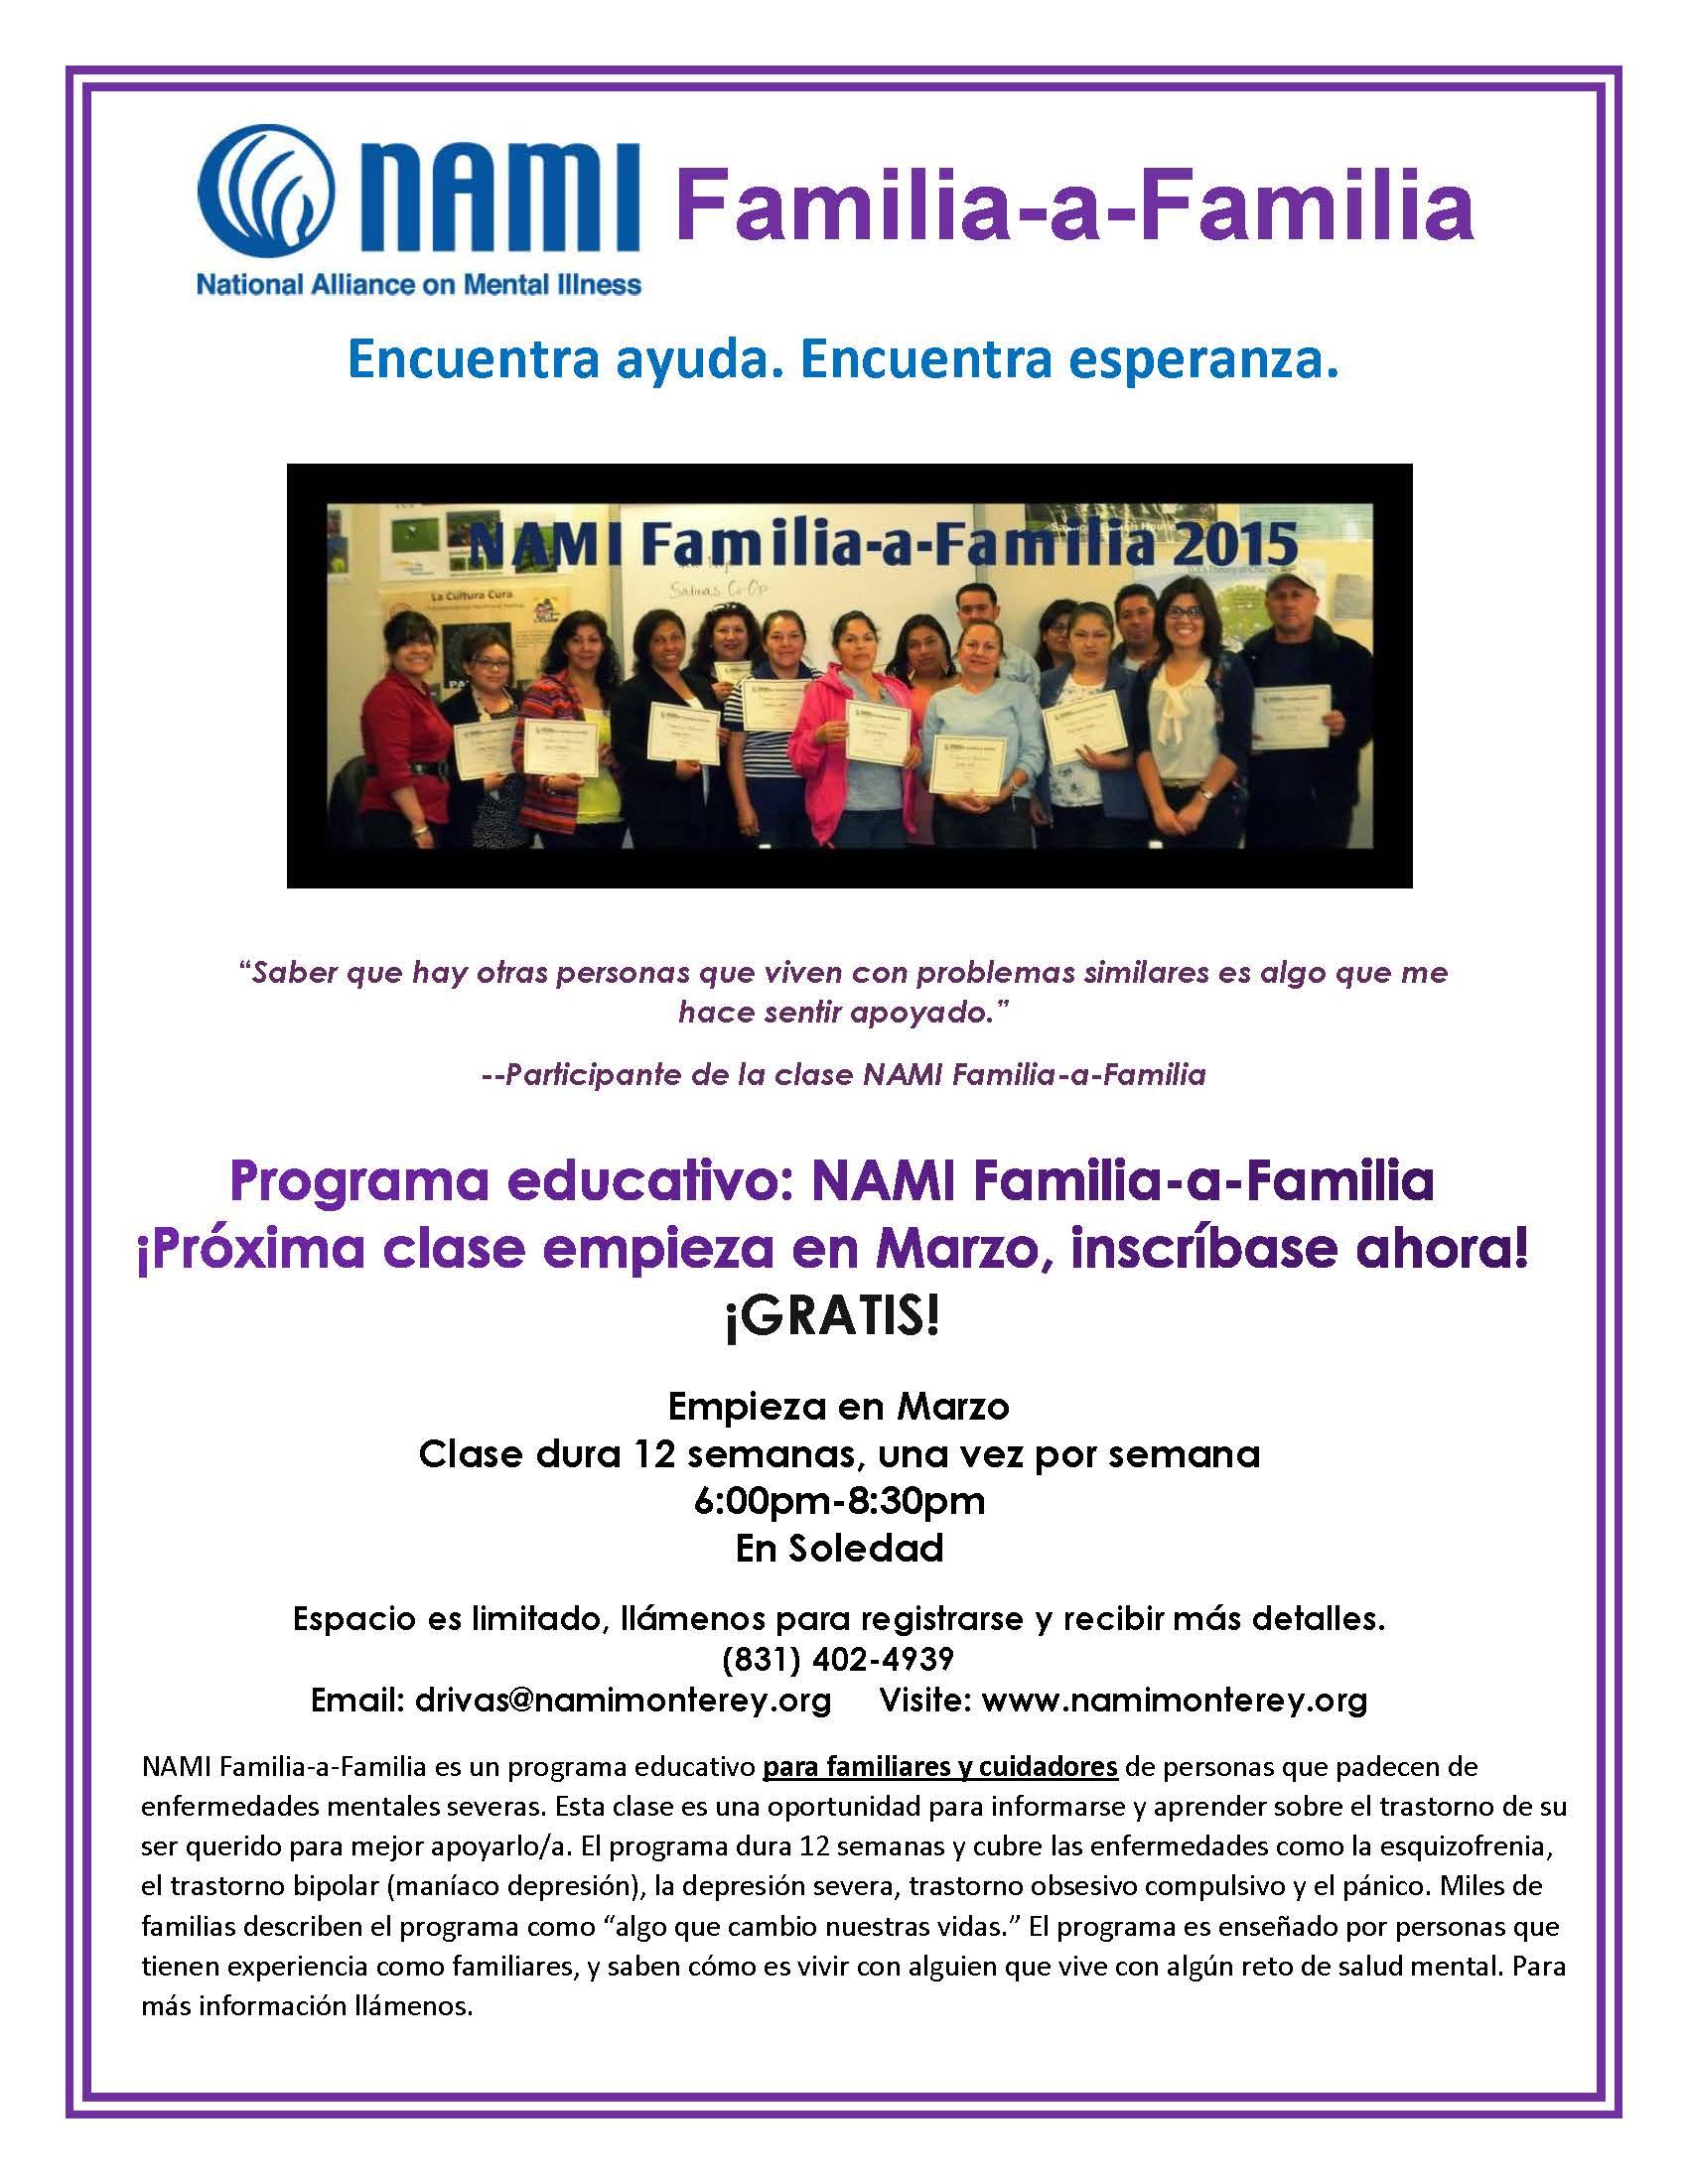 New FaF Flyer_SpanSoledad_Page_1